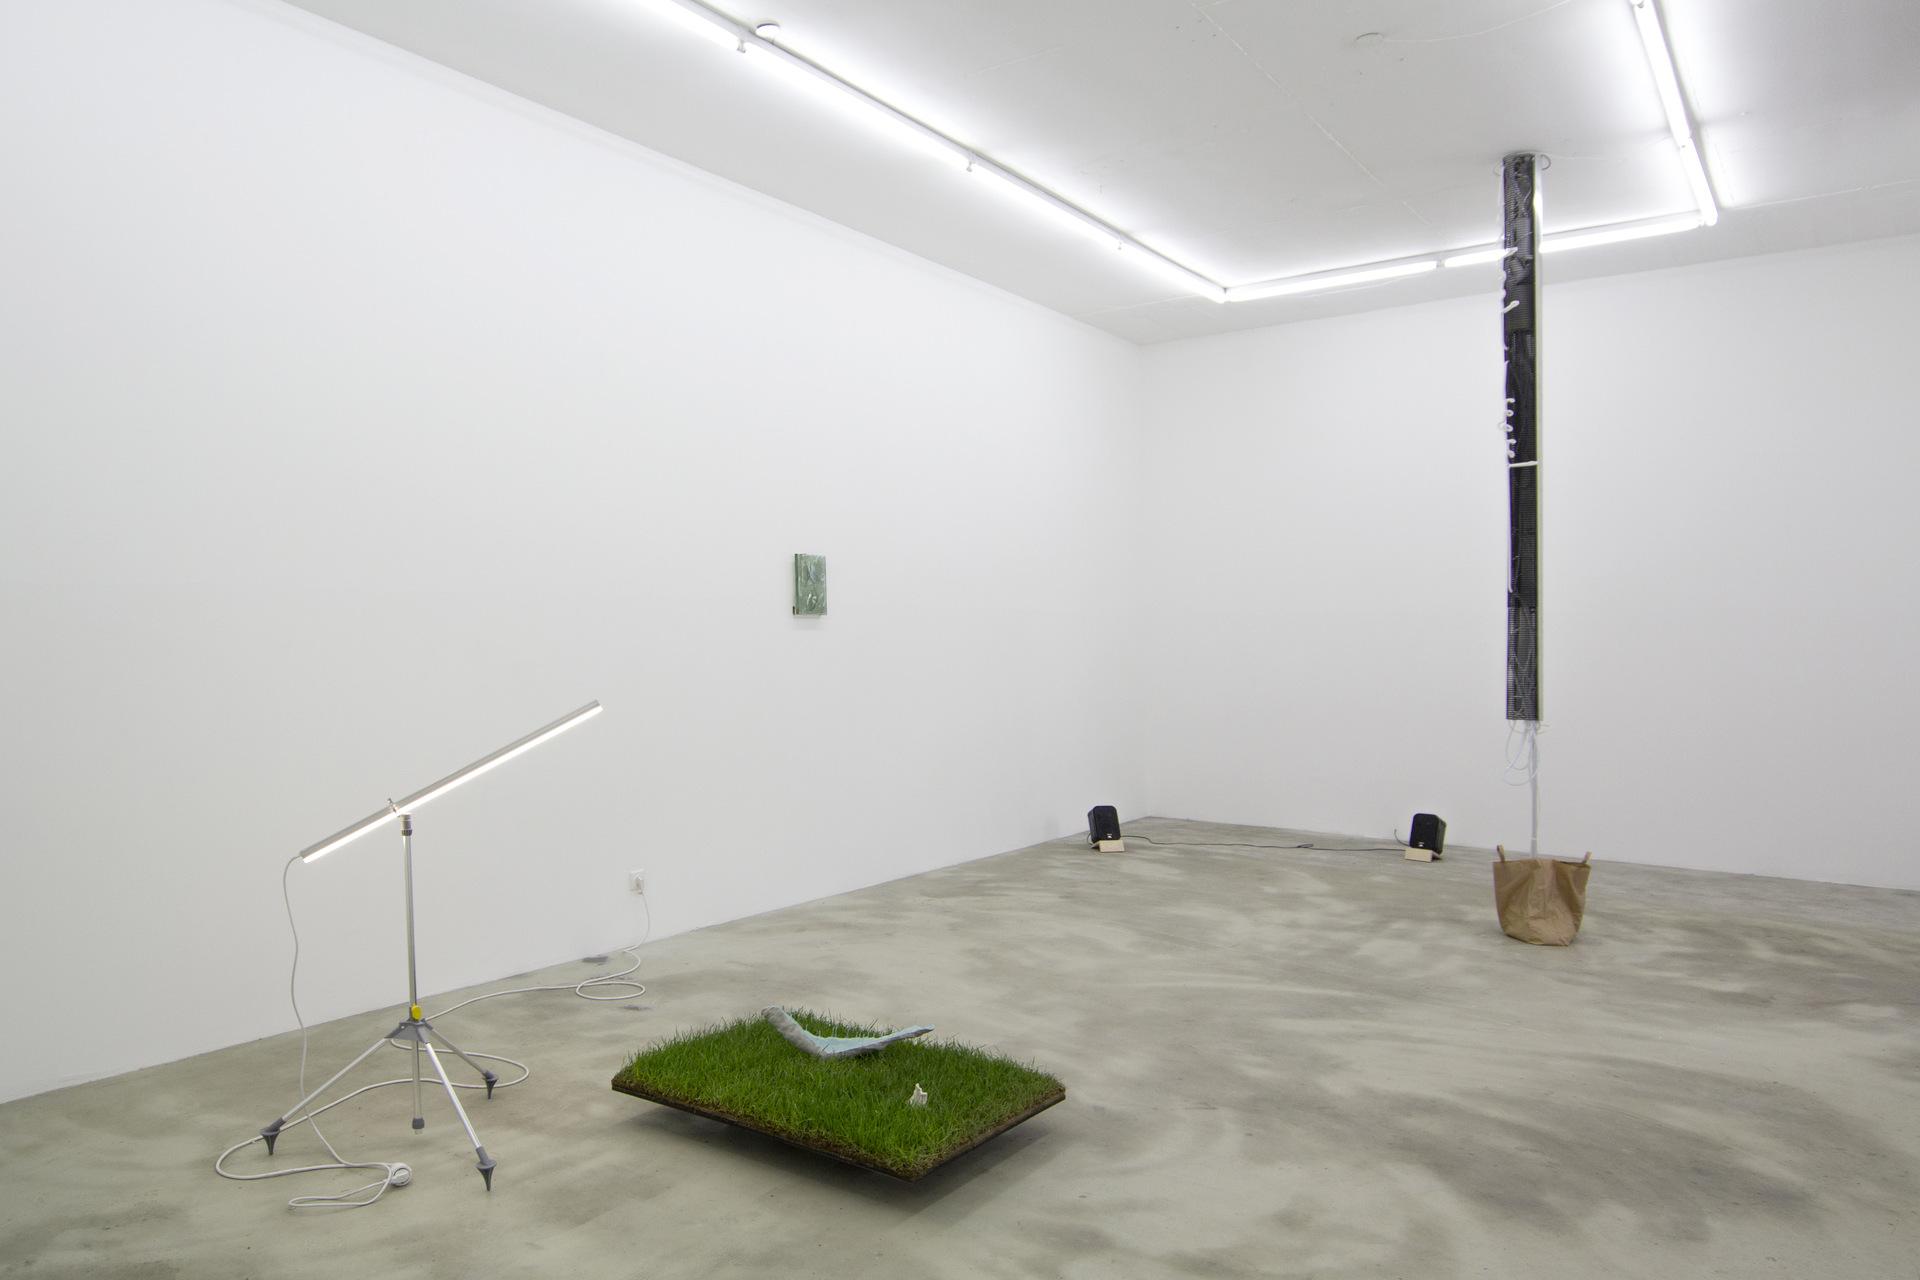 15-soy-capitan-pakui-hardware-mikkel-carl-anna-zett-daniel-stempfer-dominik-gohla-2015